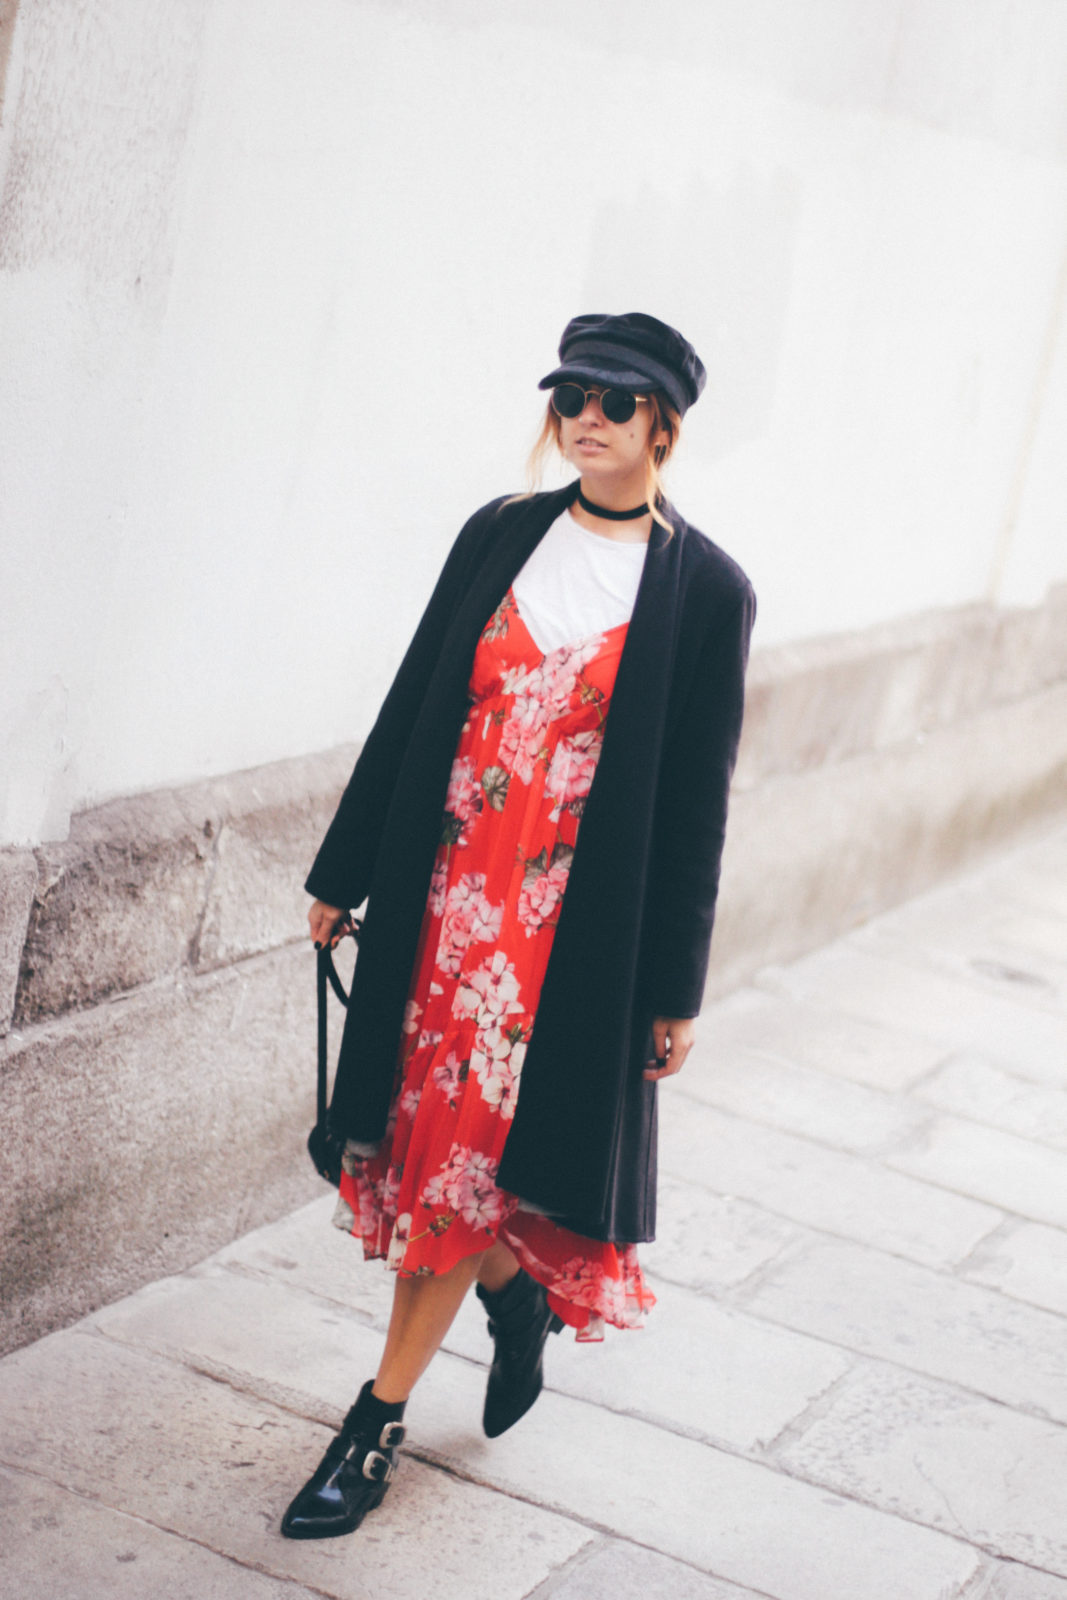 baker_boy_hat_vestido_con_camiseta_gorra_marinera_botines_hebillas_fall_2016_trends_street_style_outfits_donkeycool-12